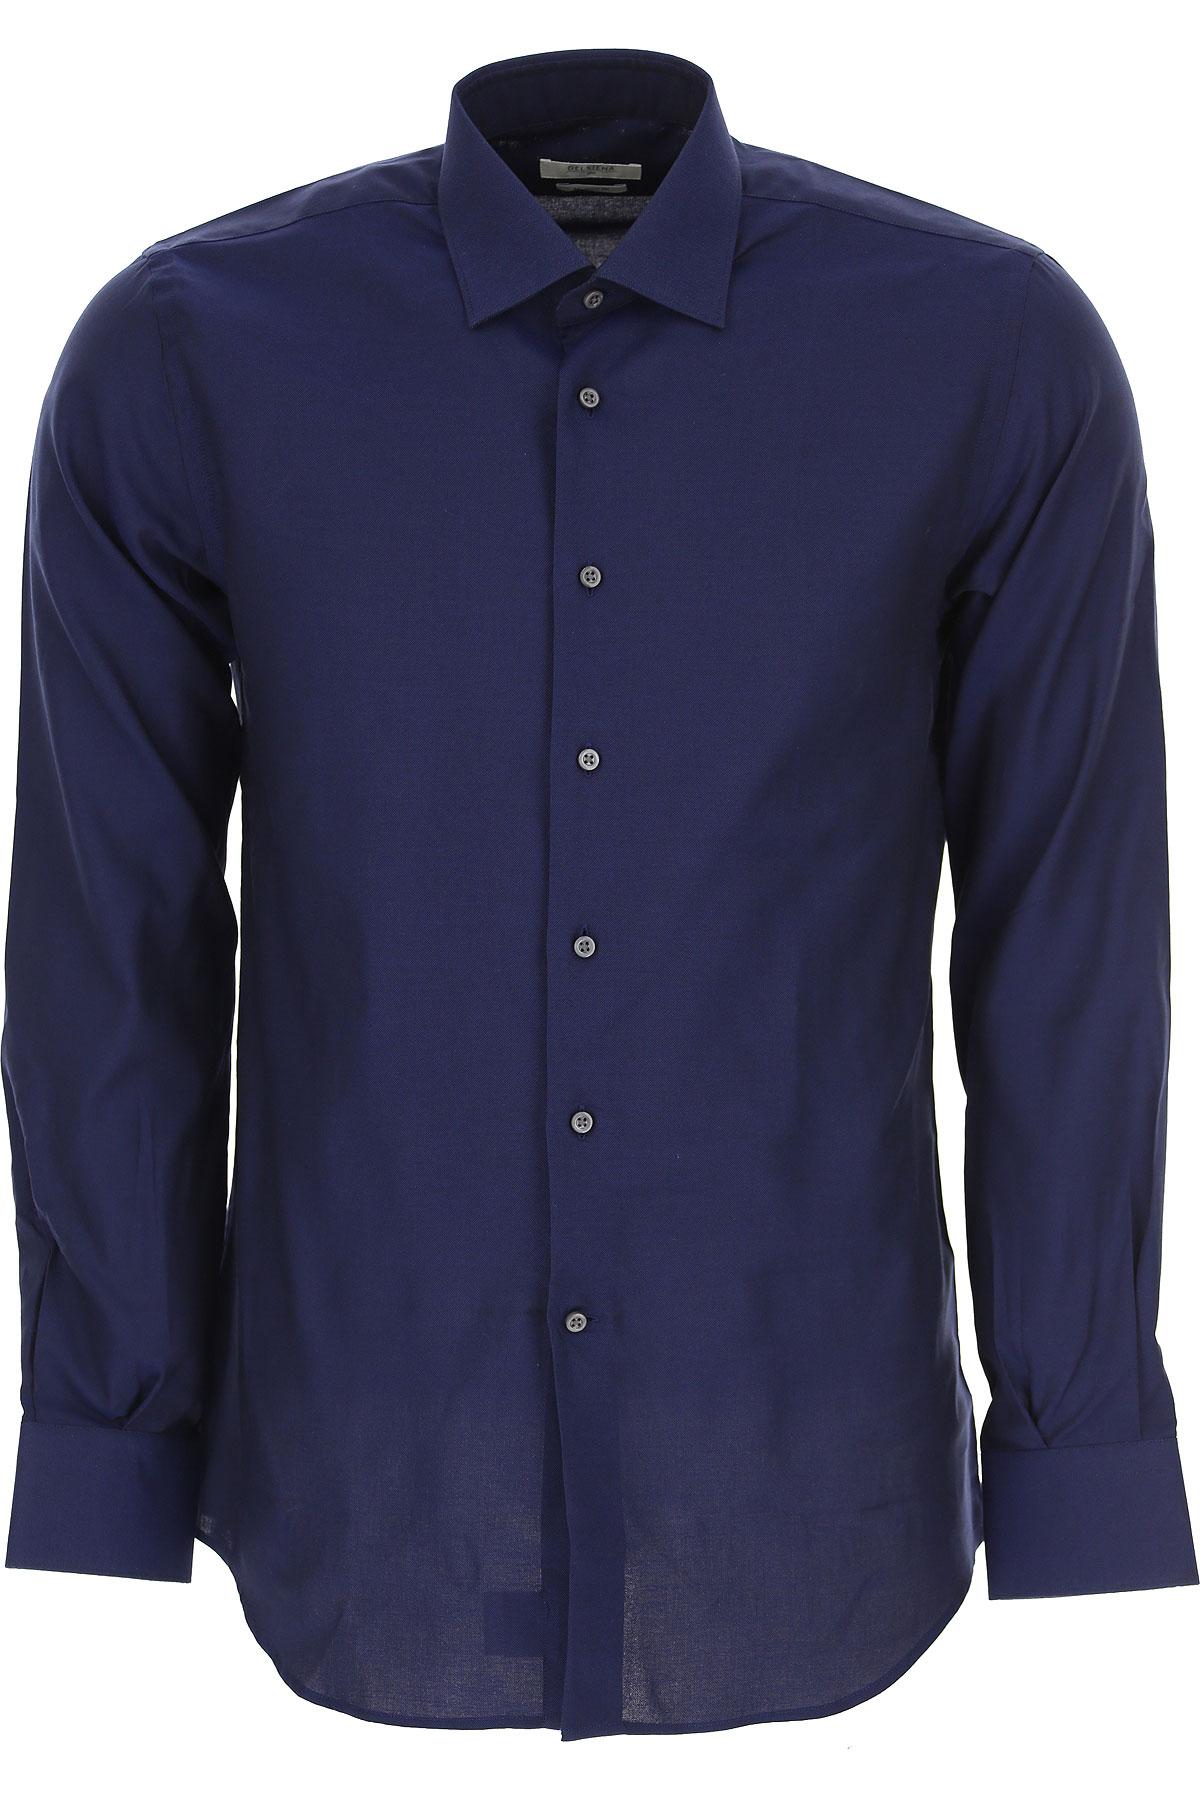 Del Siena Shirt for Men On Sale, Dark Blue, Cotton, 2019, 15.5 15.75 16 16.5